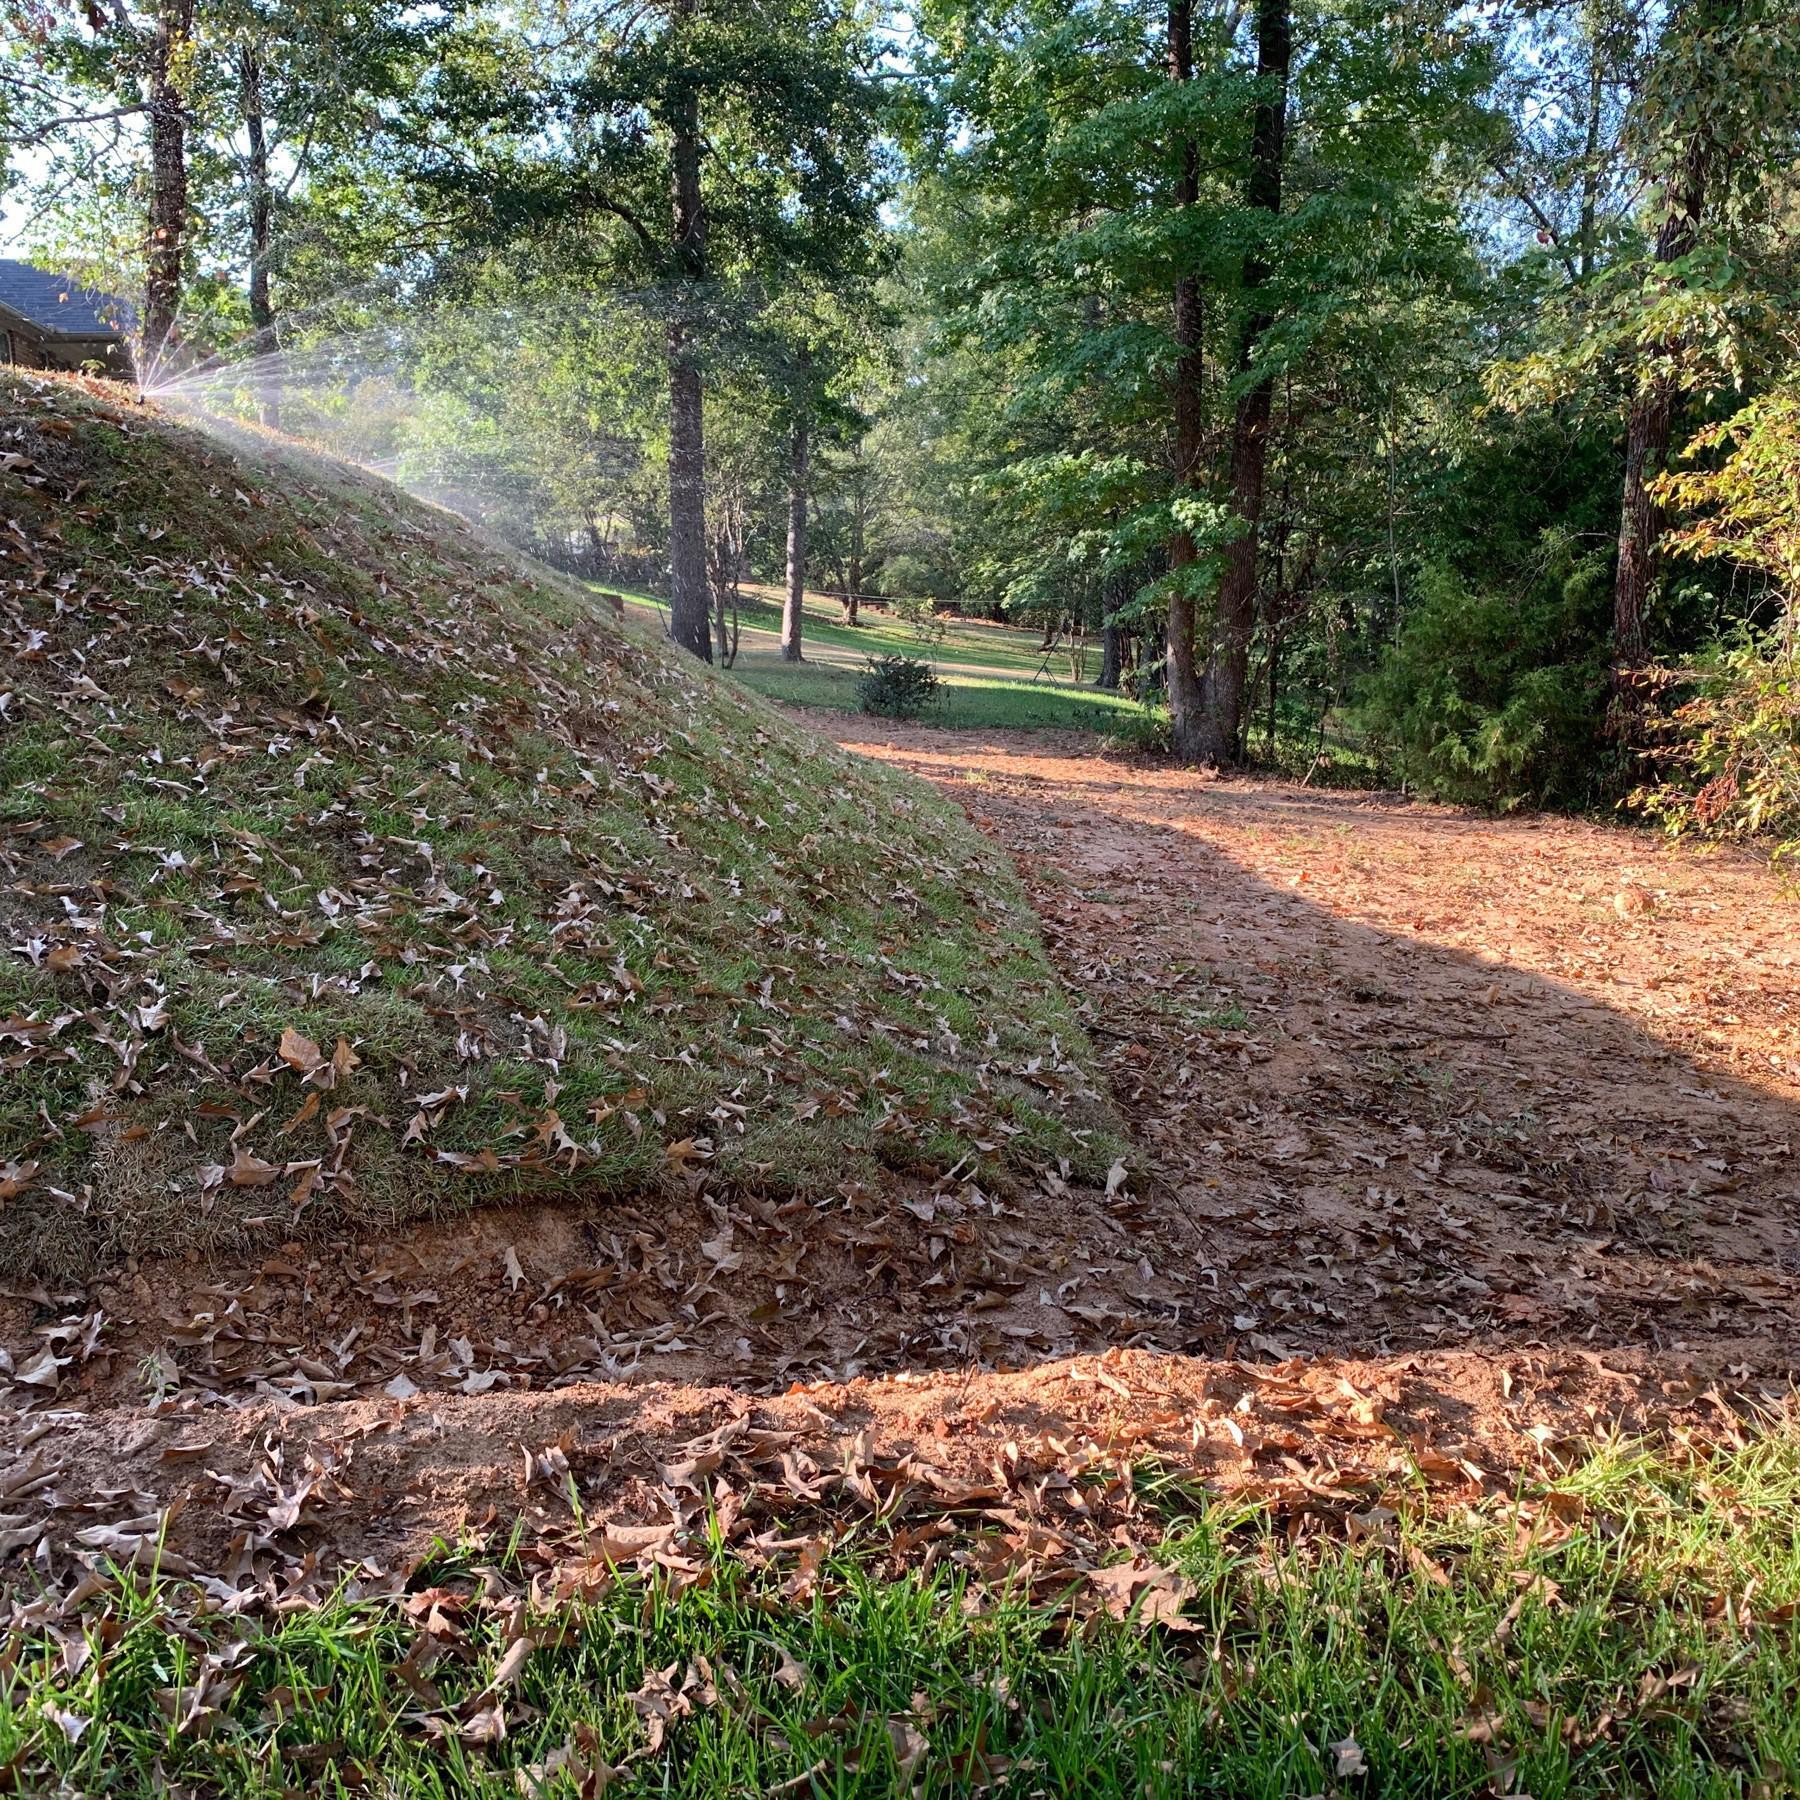 New house back yard on steep incline